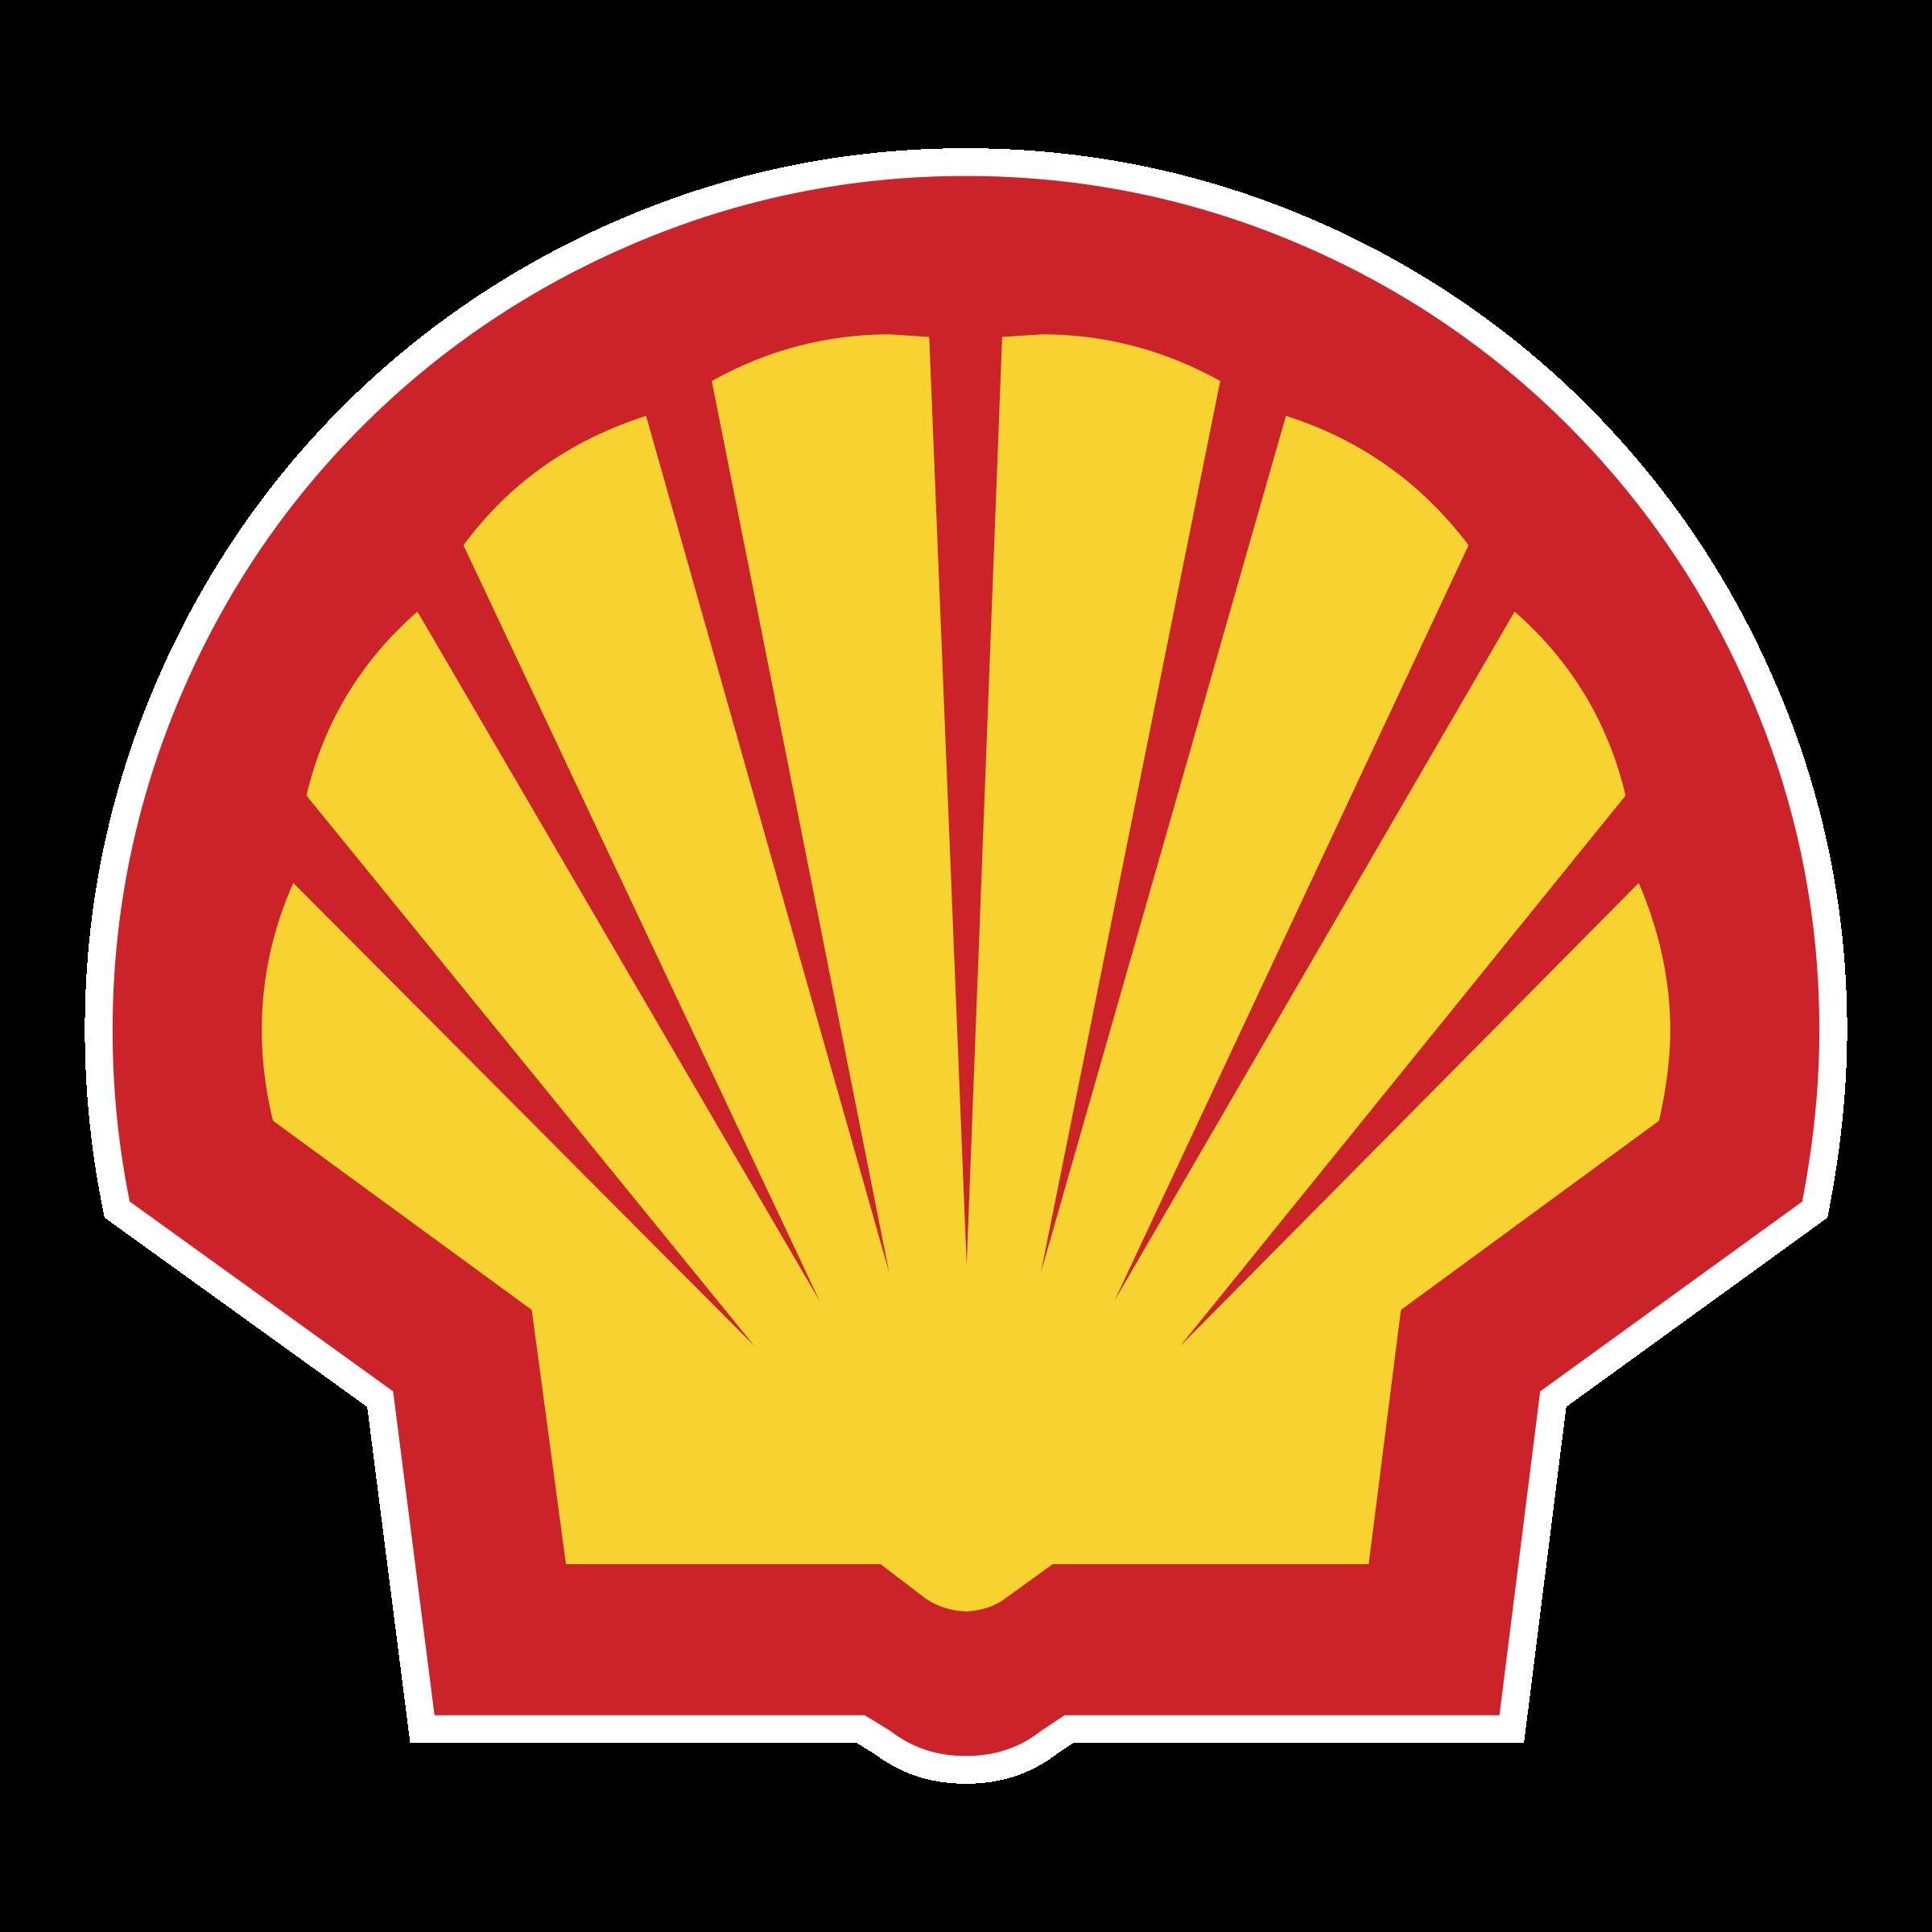 shell-4-logo-png-transparent.png